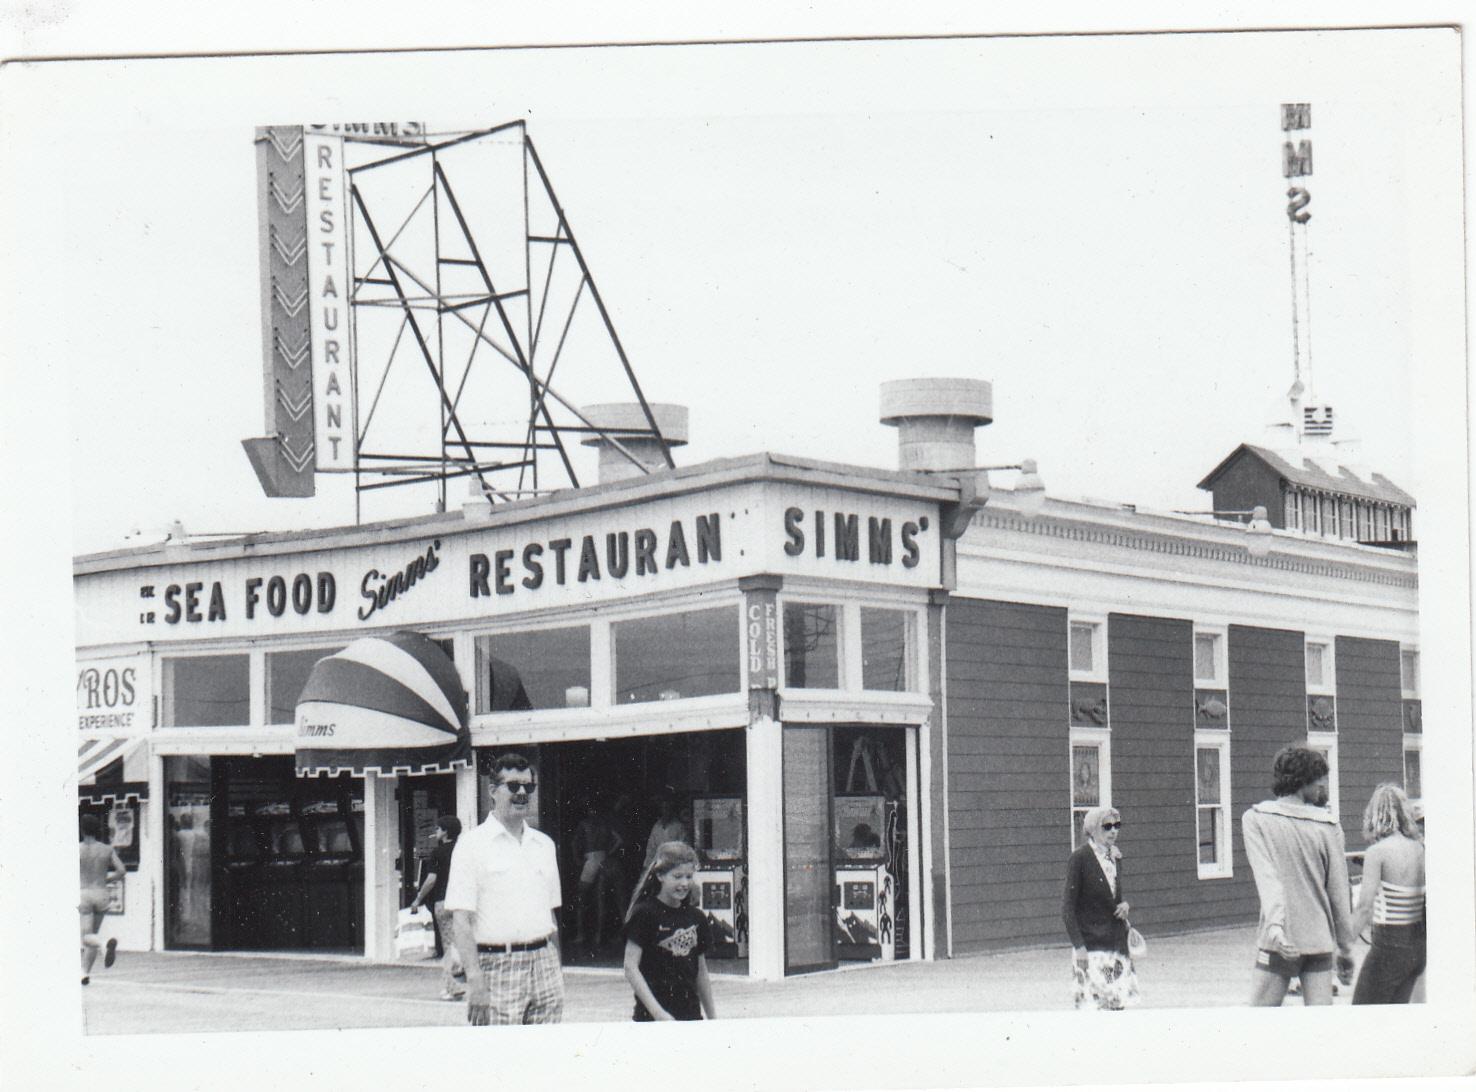 Simms Restaurant 8th Street Boardwalk